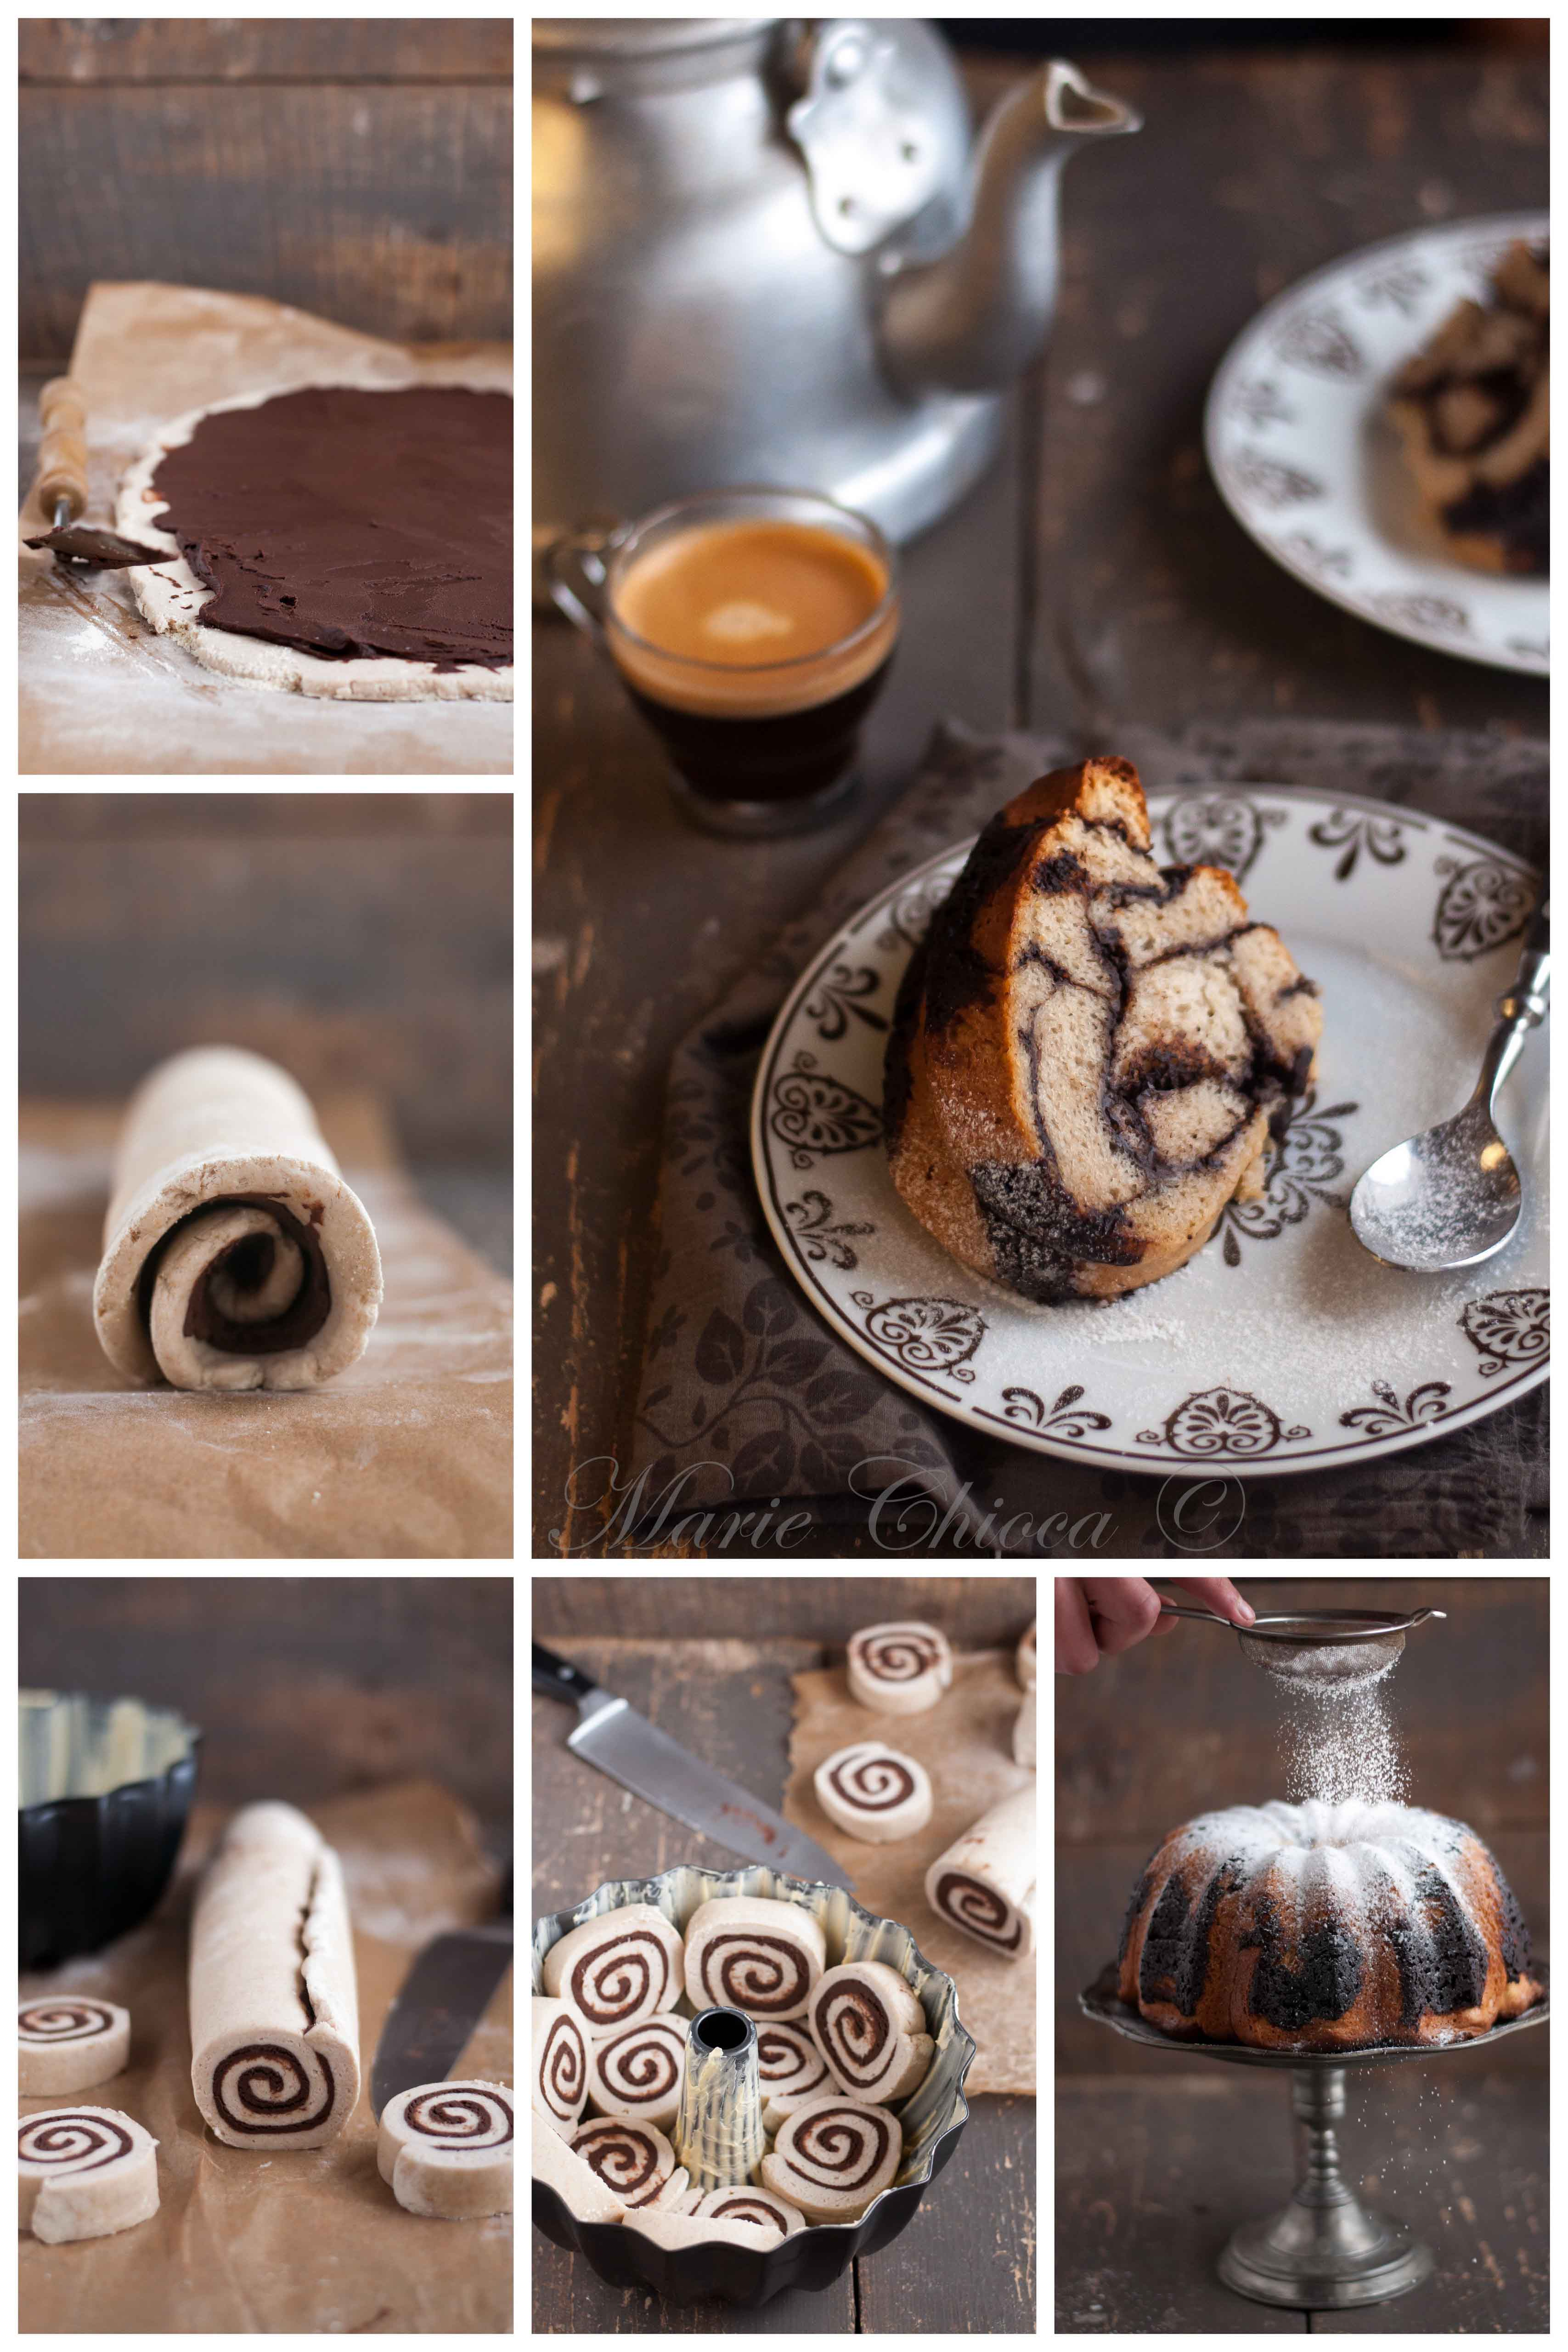 babka-coco-chocolat-montage-2